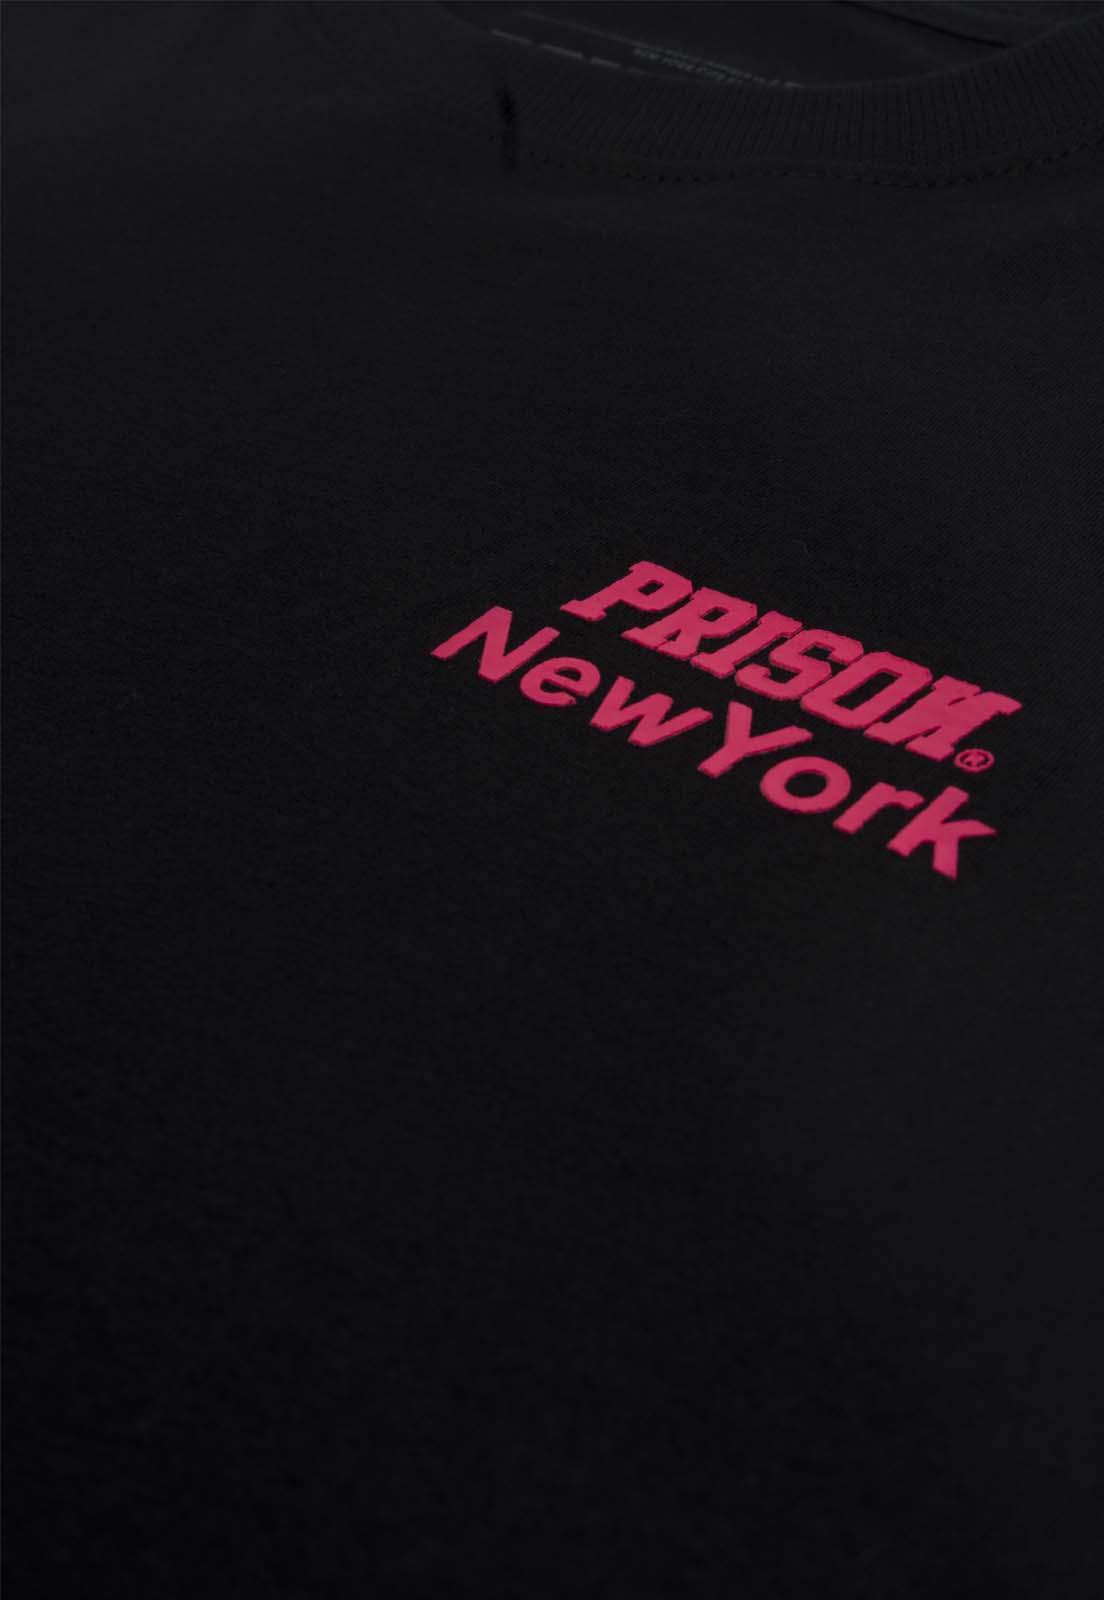 Camiseta Streetwear Prison New York Magenta